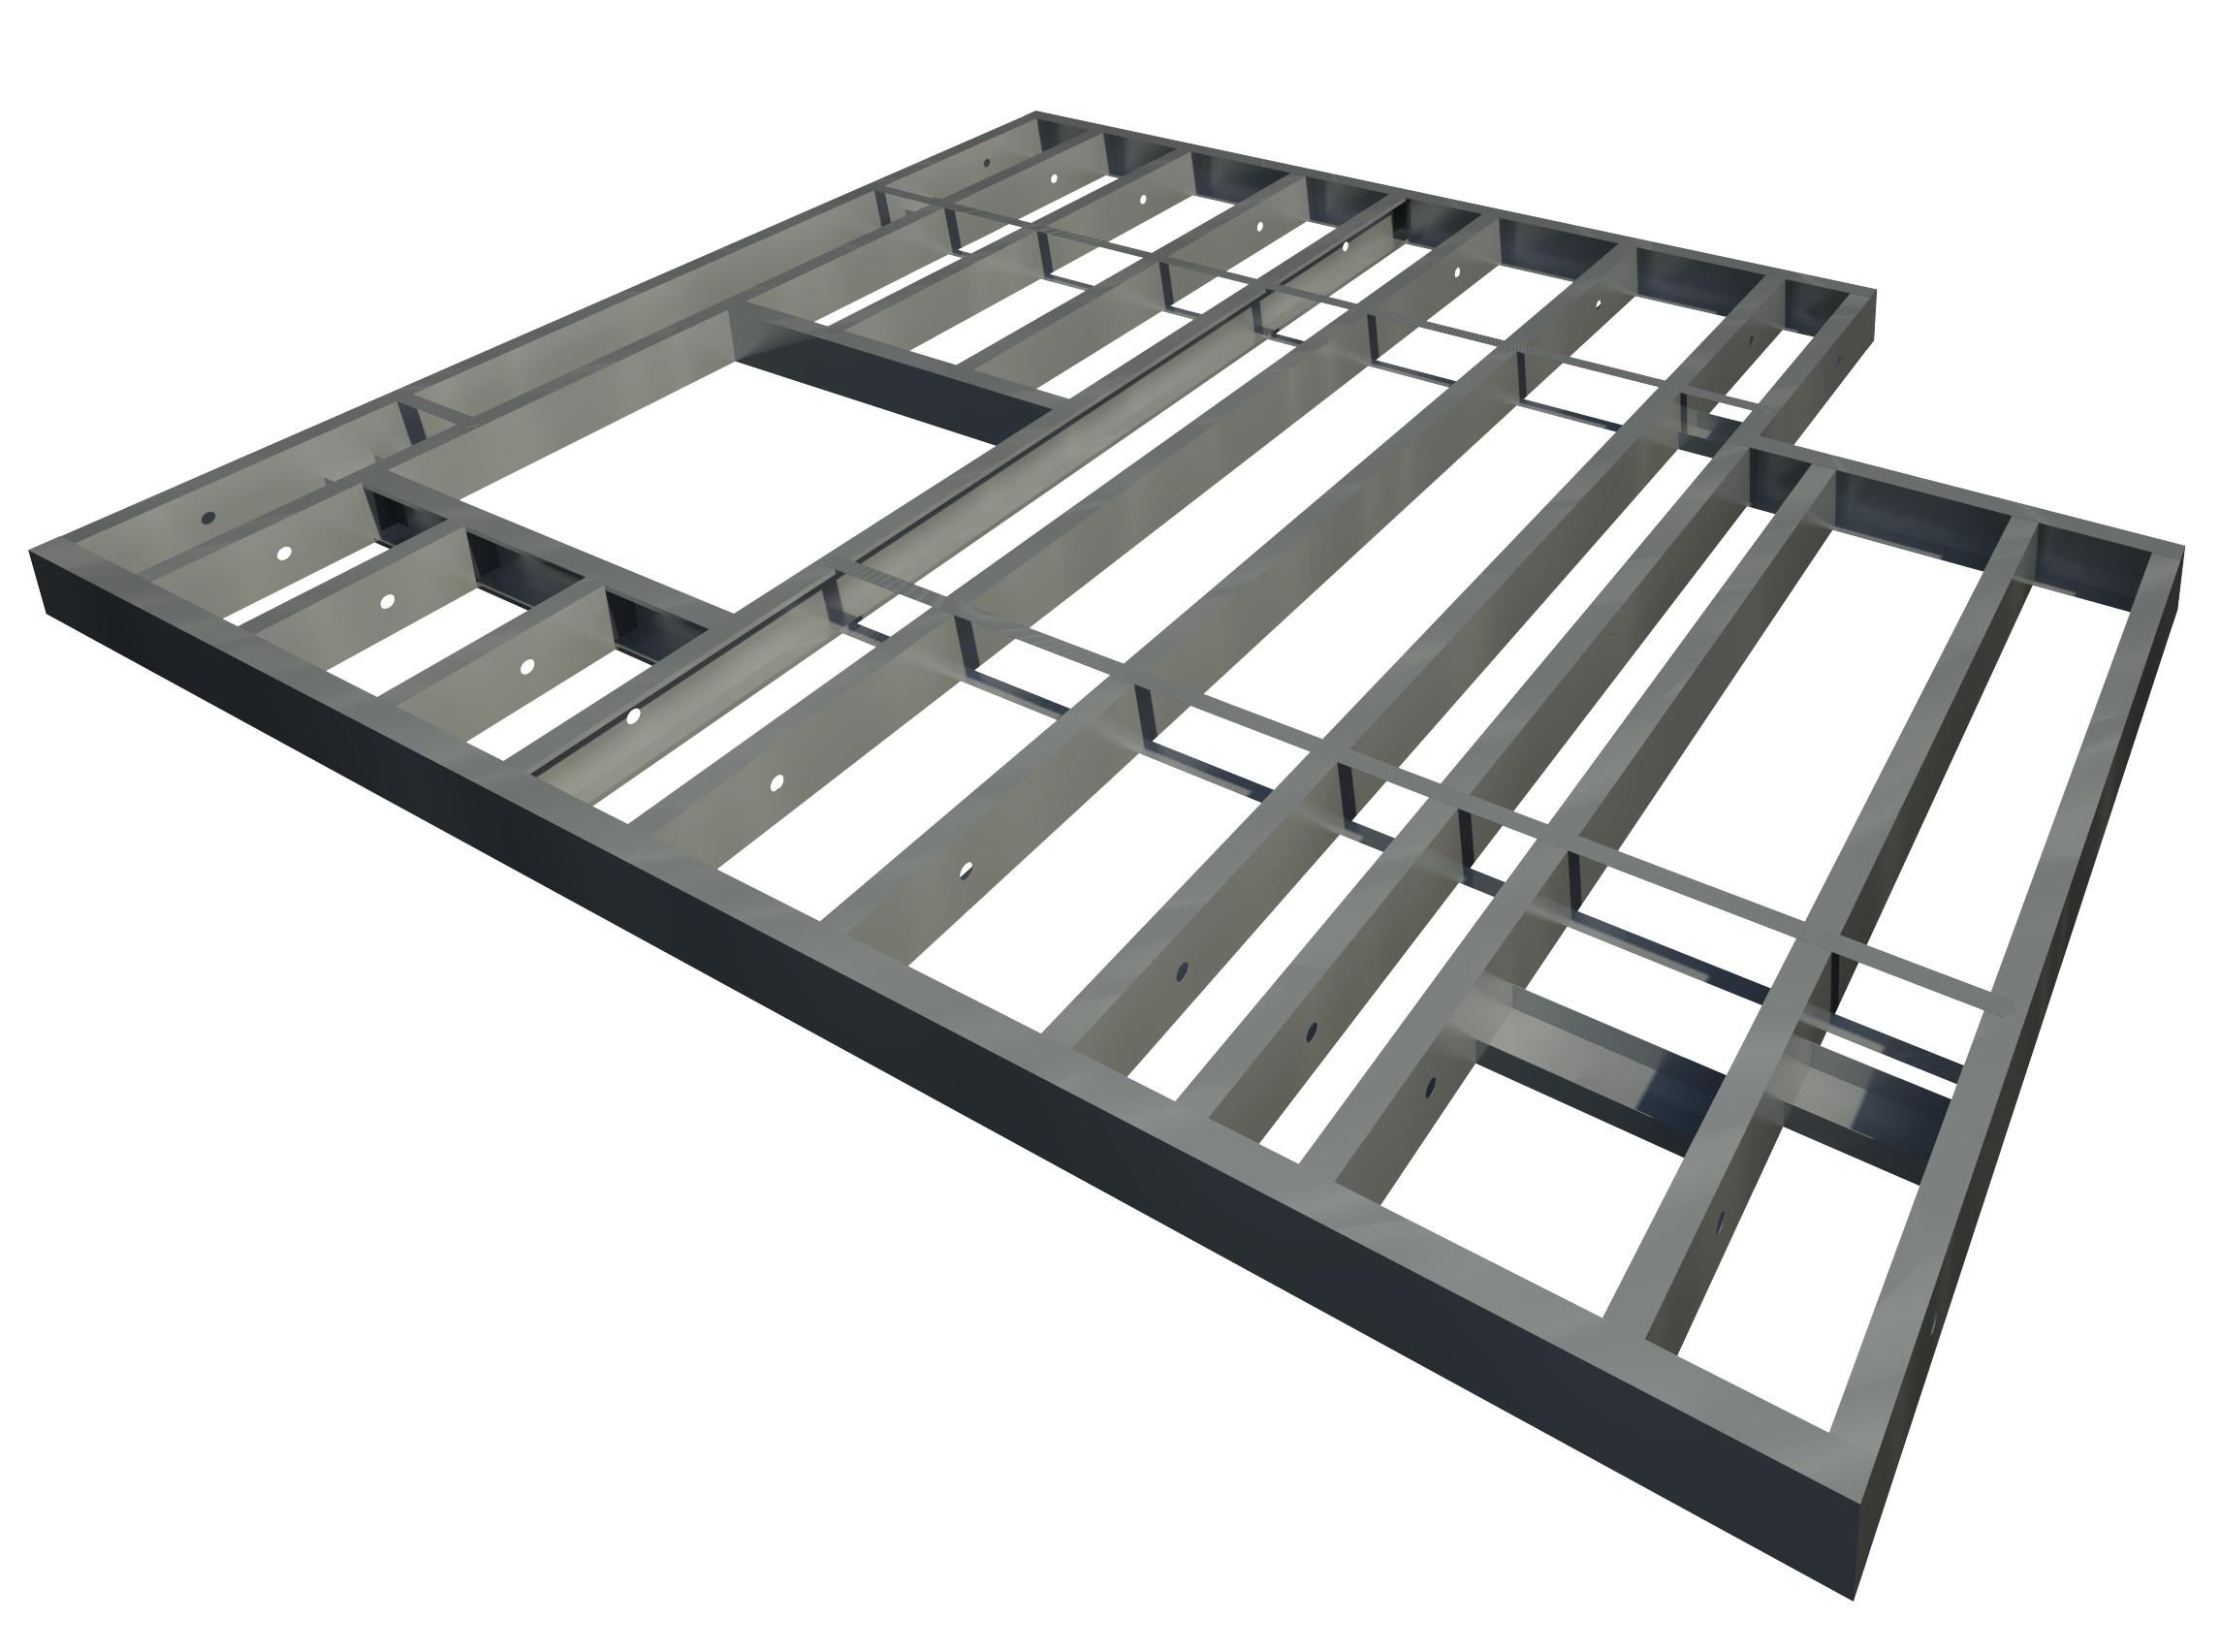 Light Gauge Steel Floor System Design in Revit® | Metal Framing ...